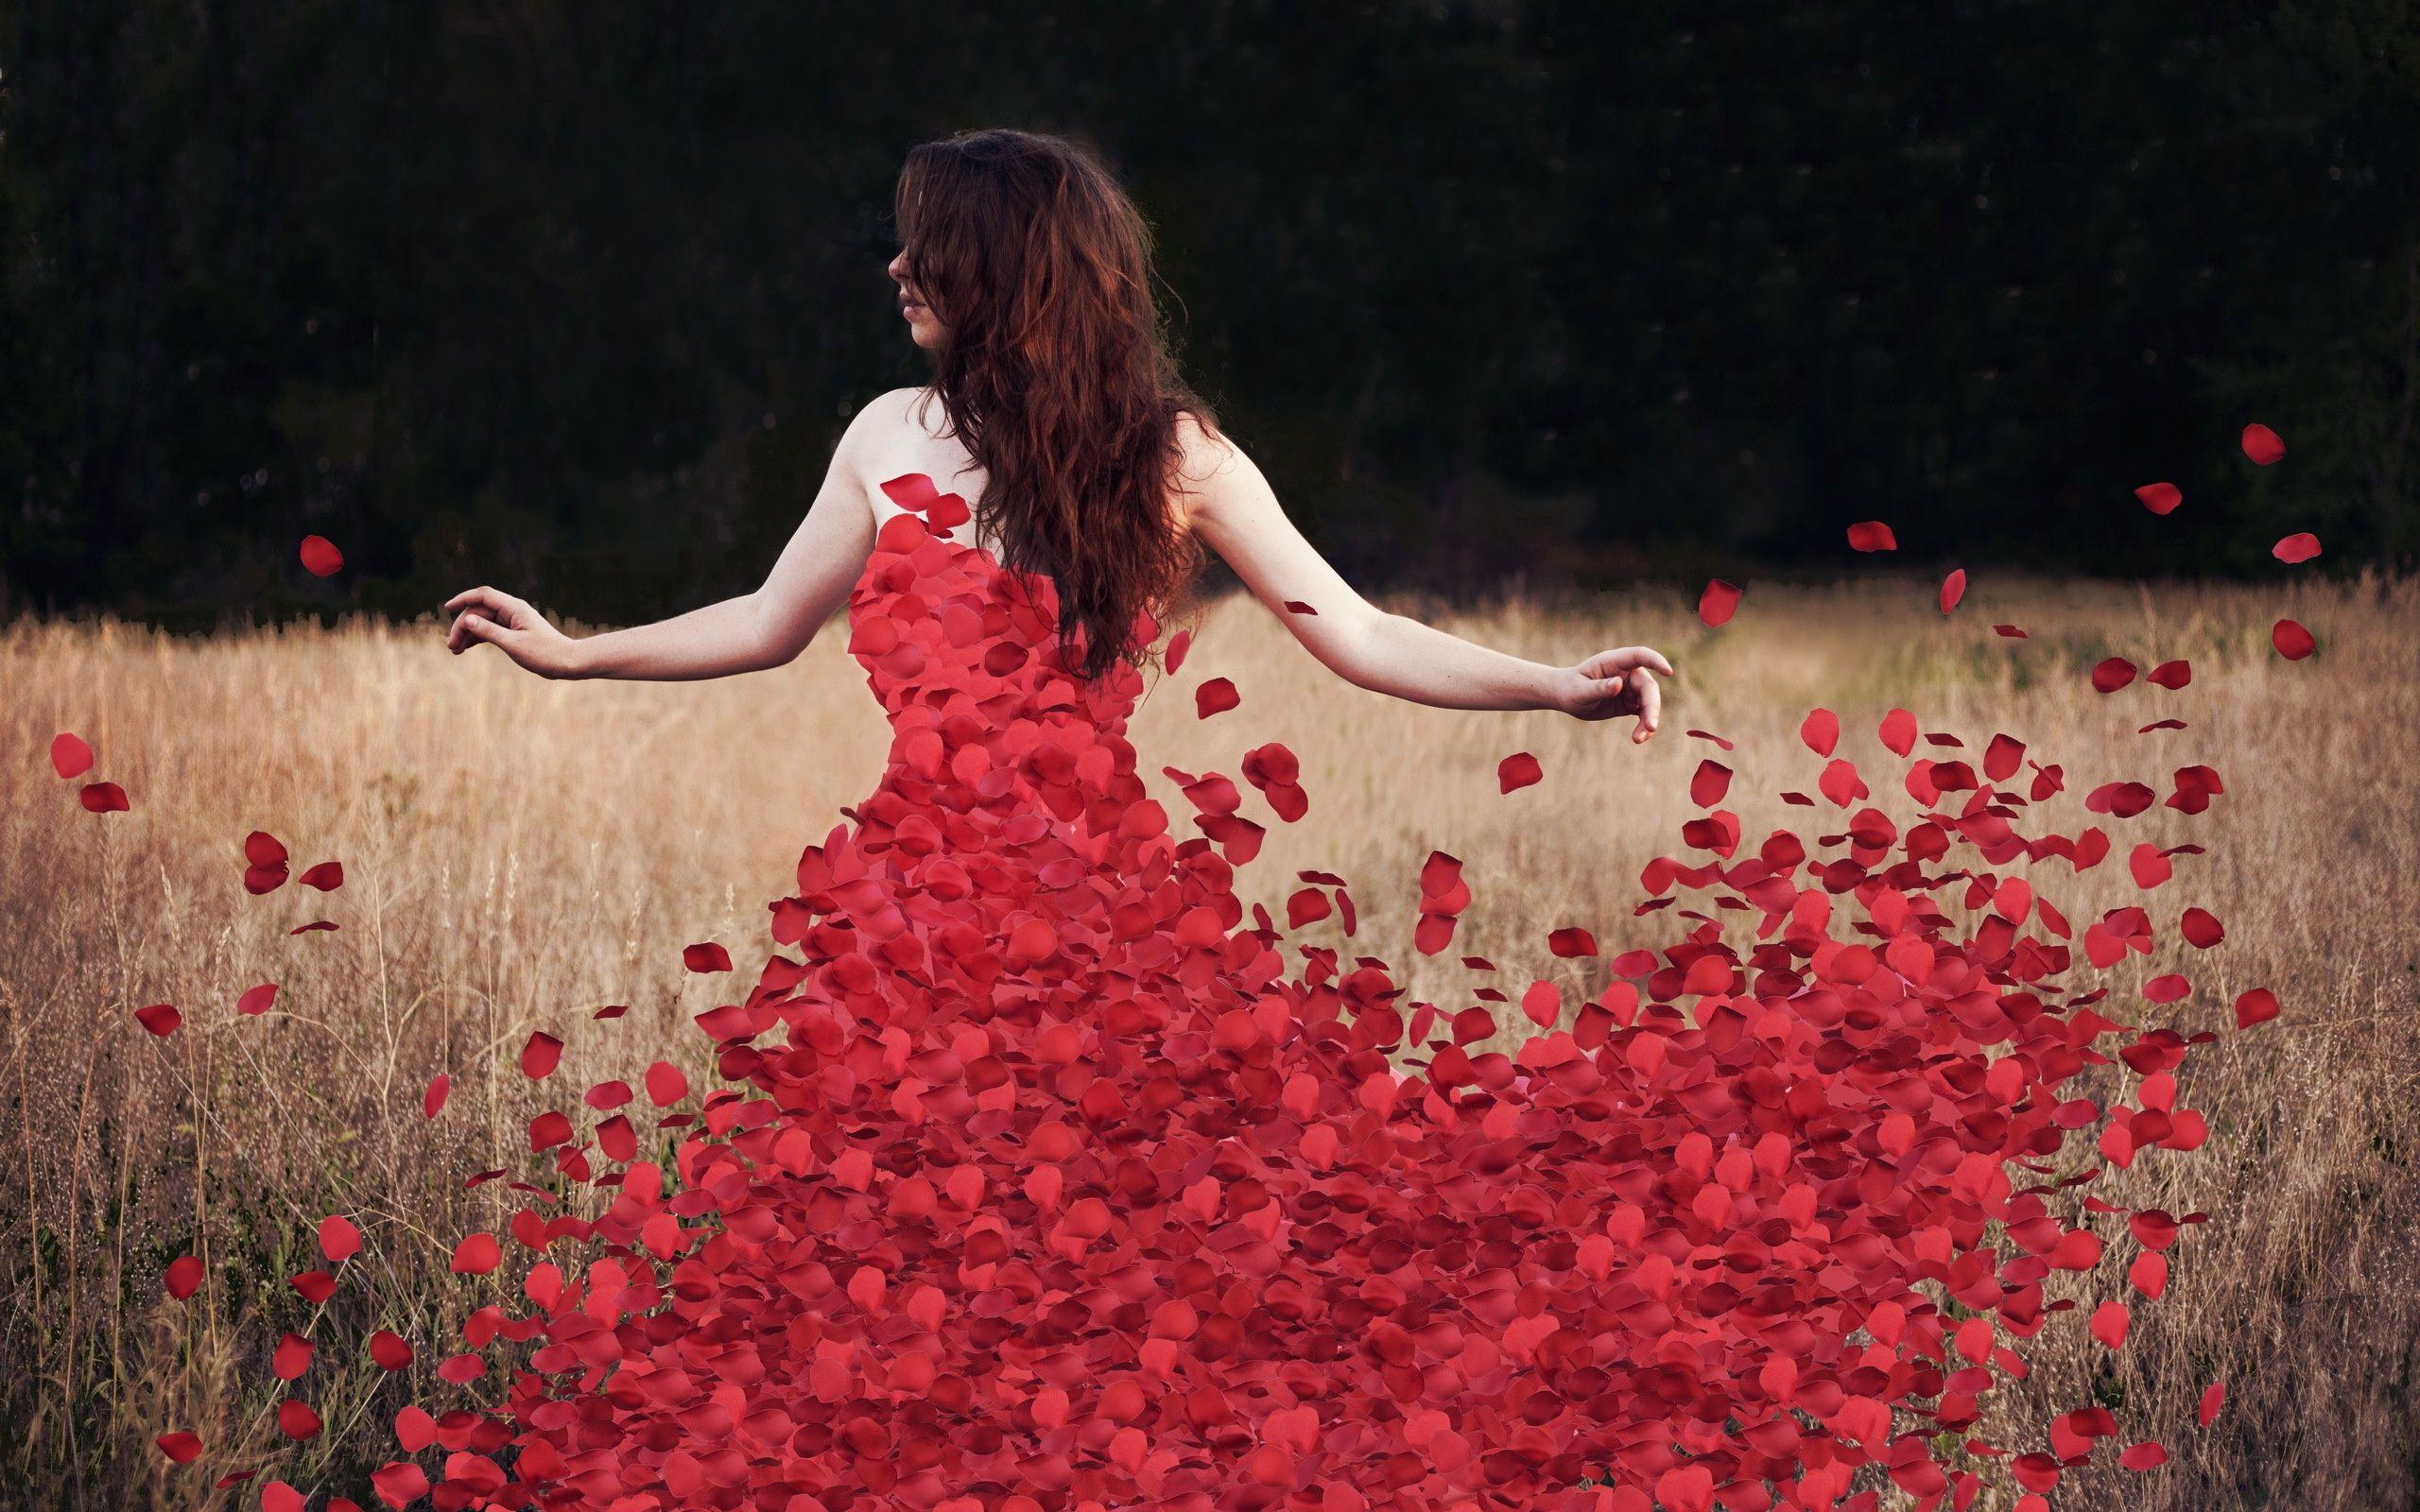 Pin By Amora On Only Girls Rose Petal Dress Flower Petal Dress Woman Silhouette